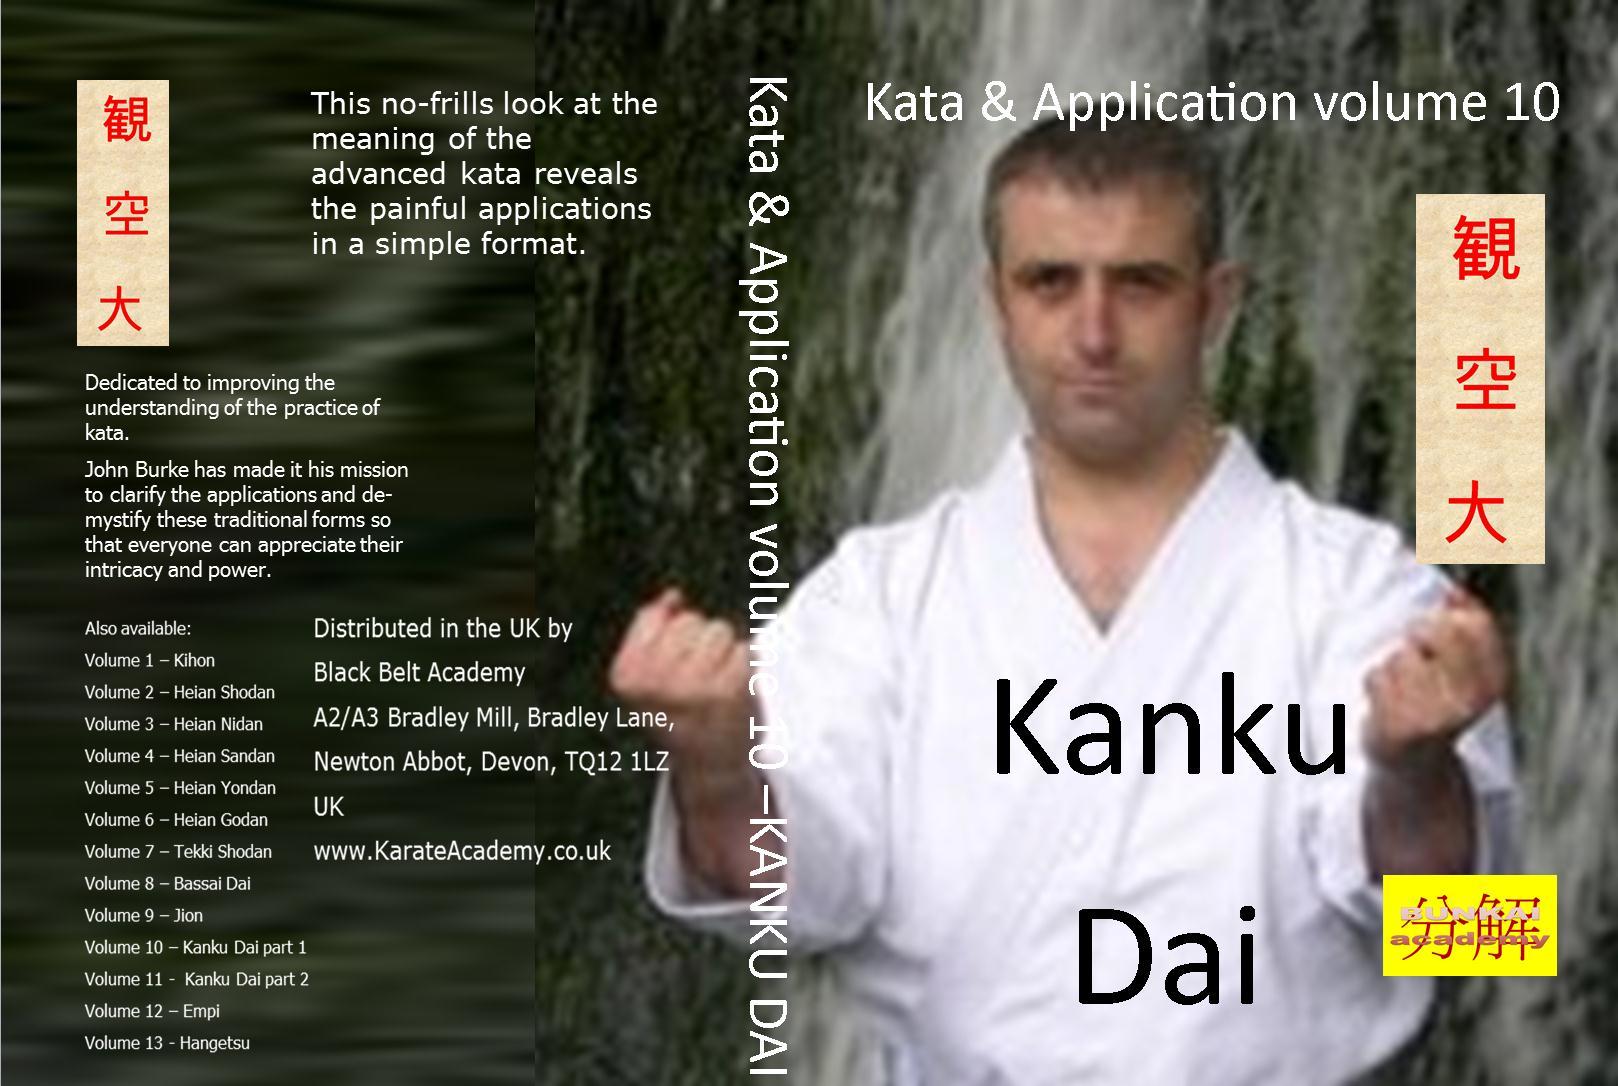 kanku dai bunkai dvd